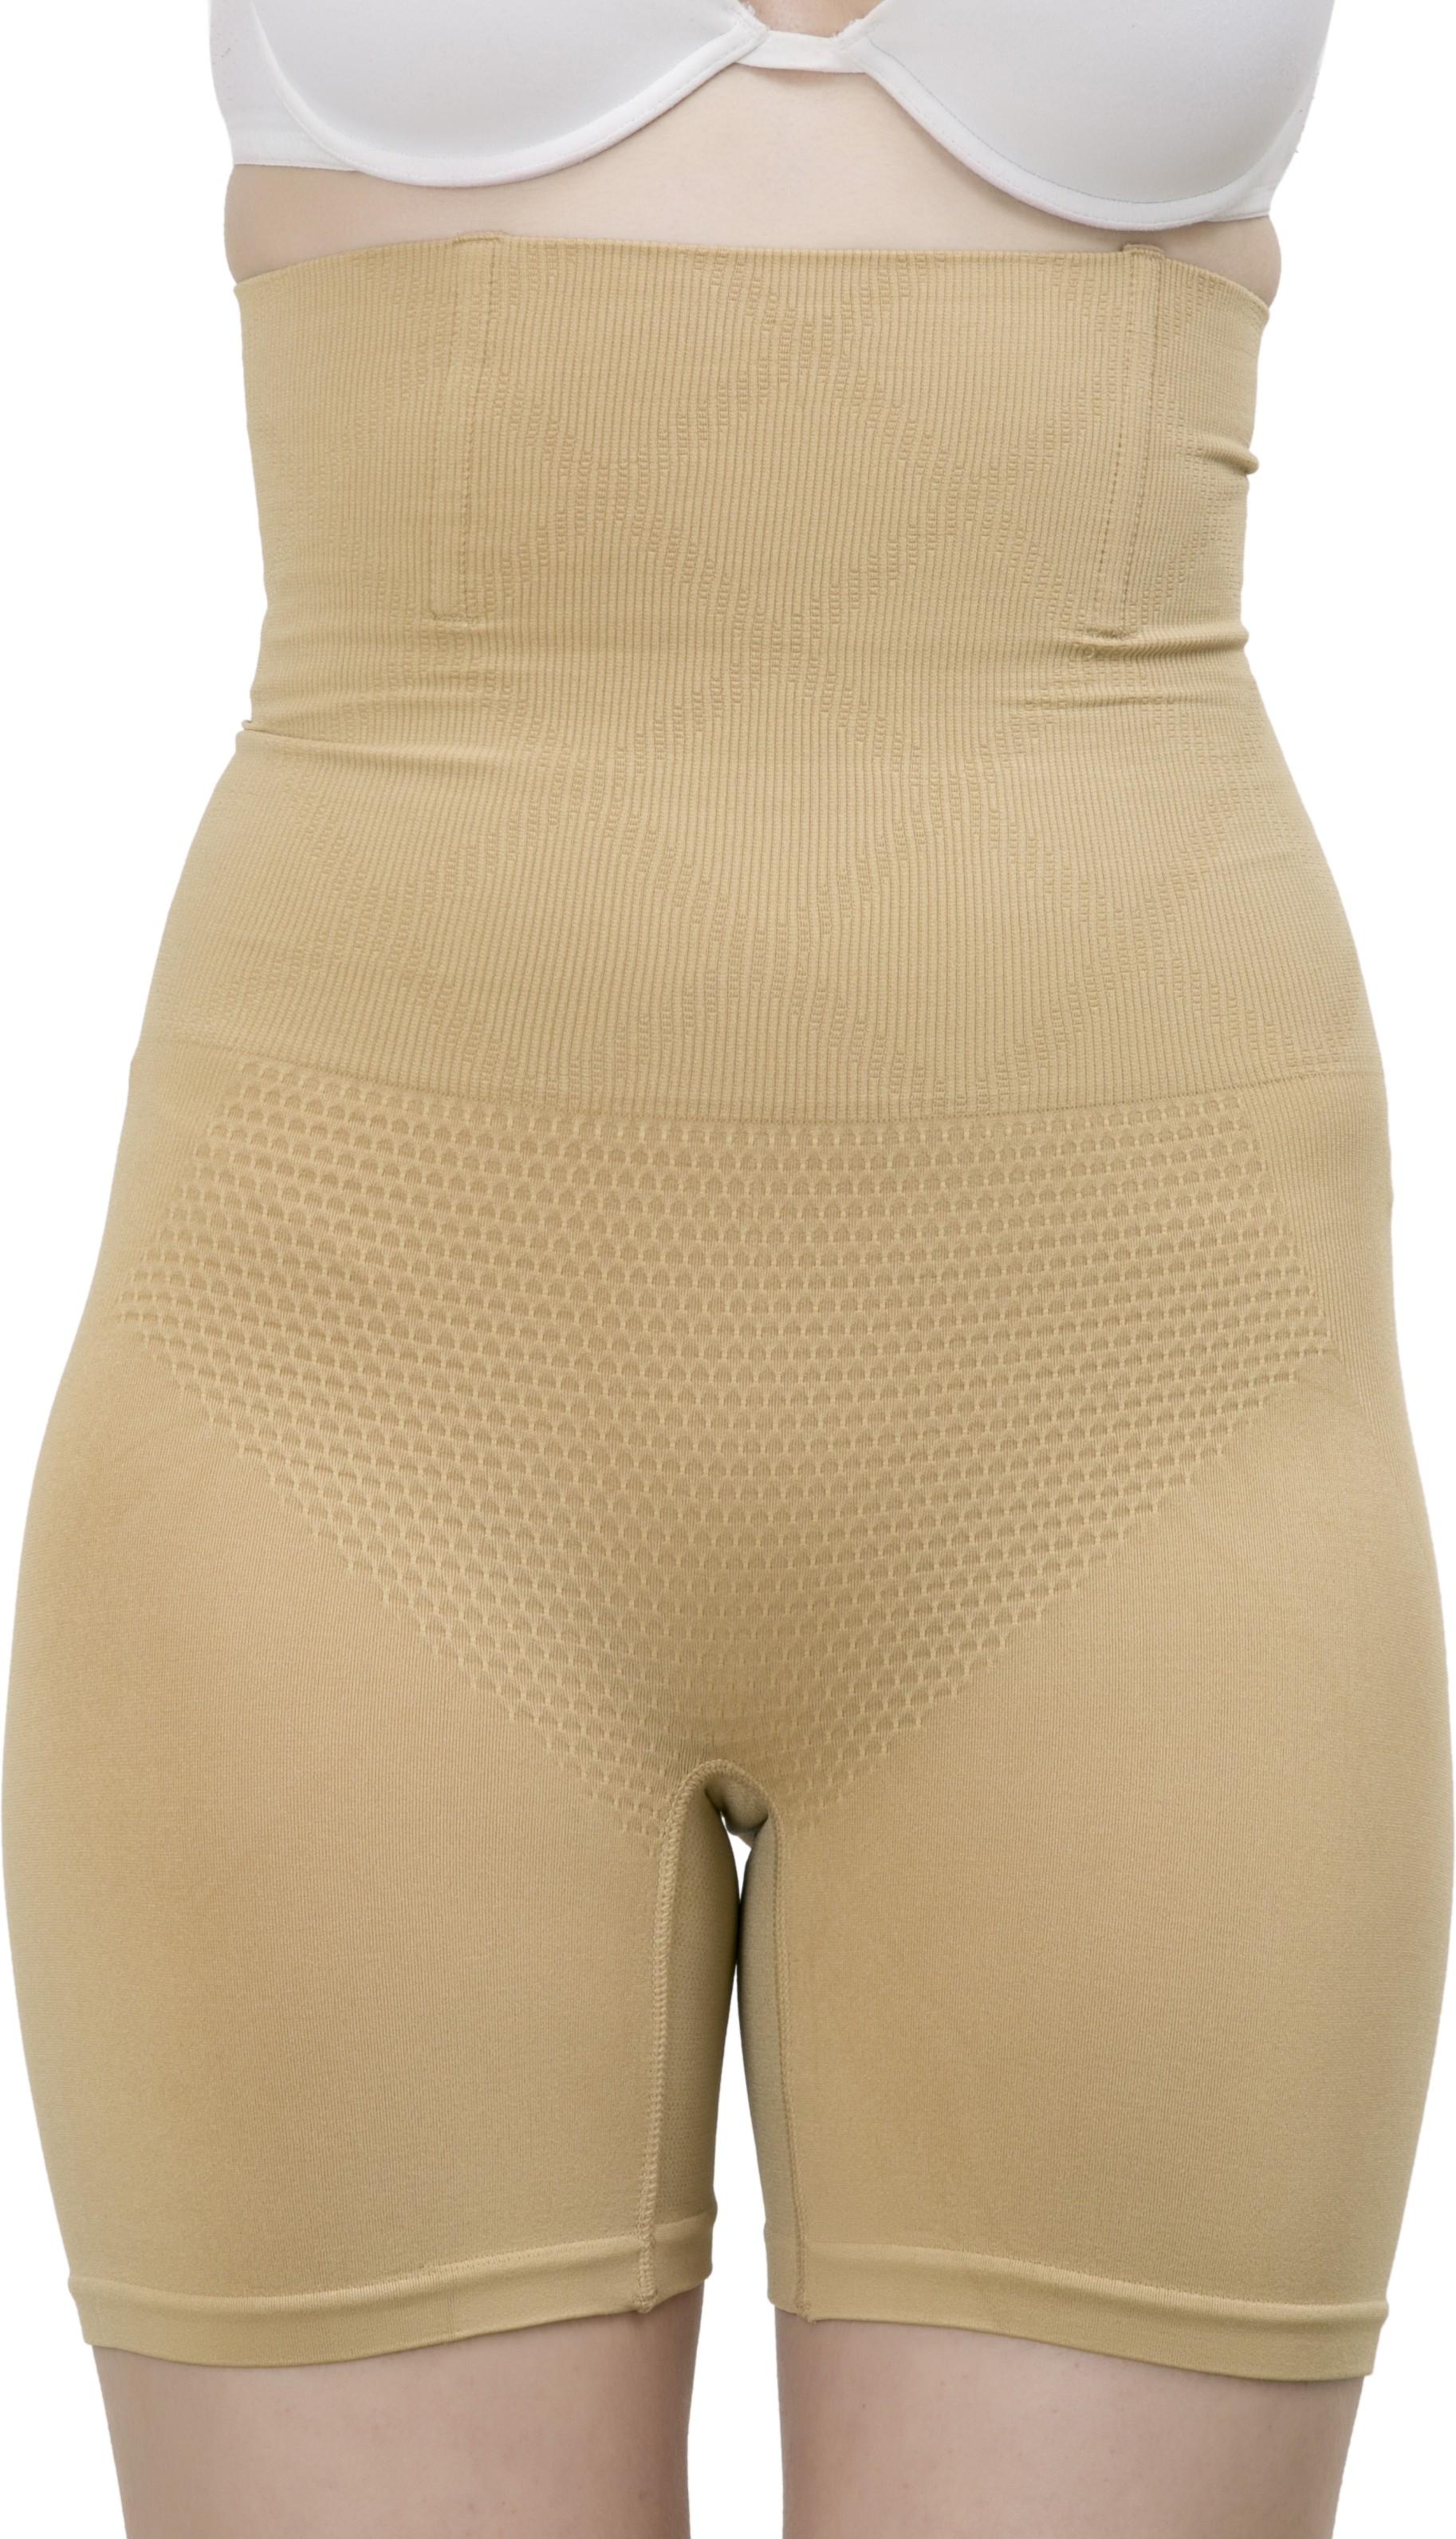 Laceandme No Rolling Wire control Womens Shapewear